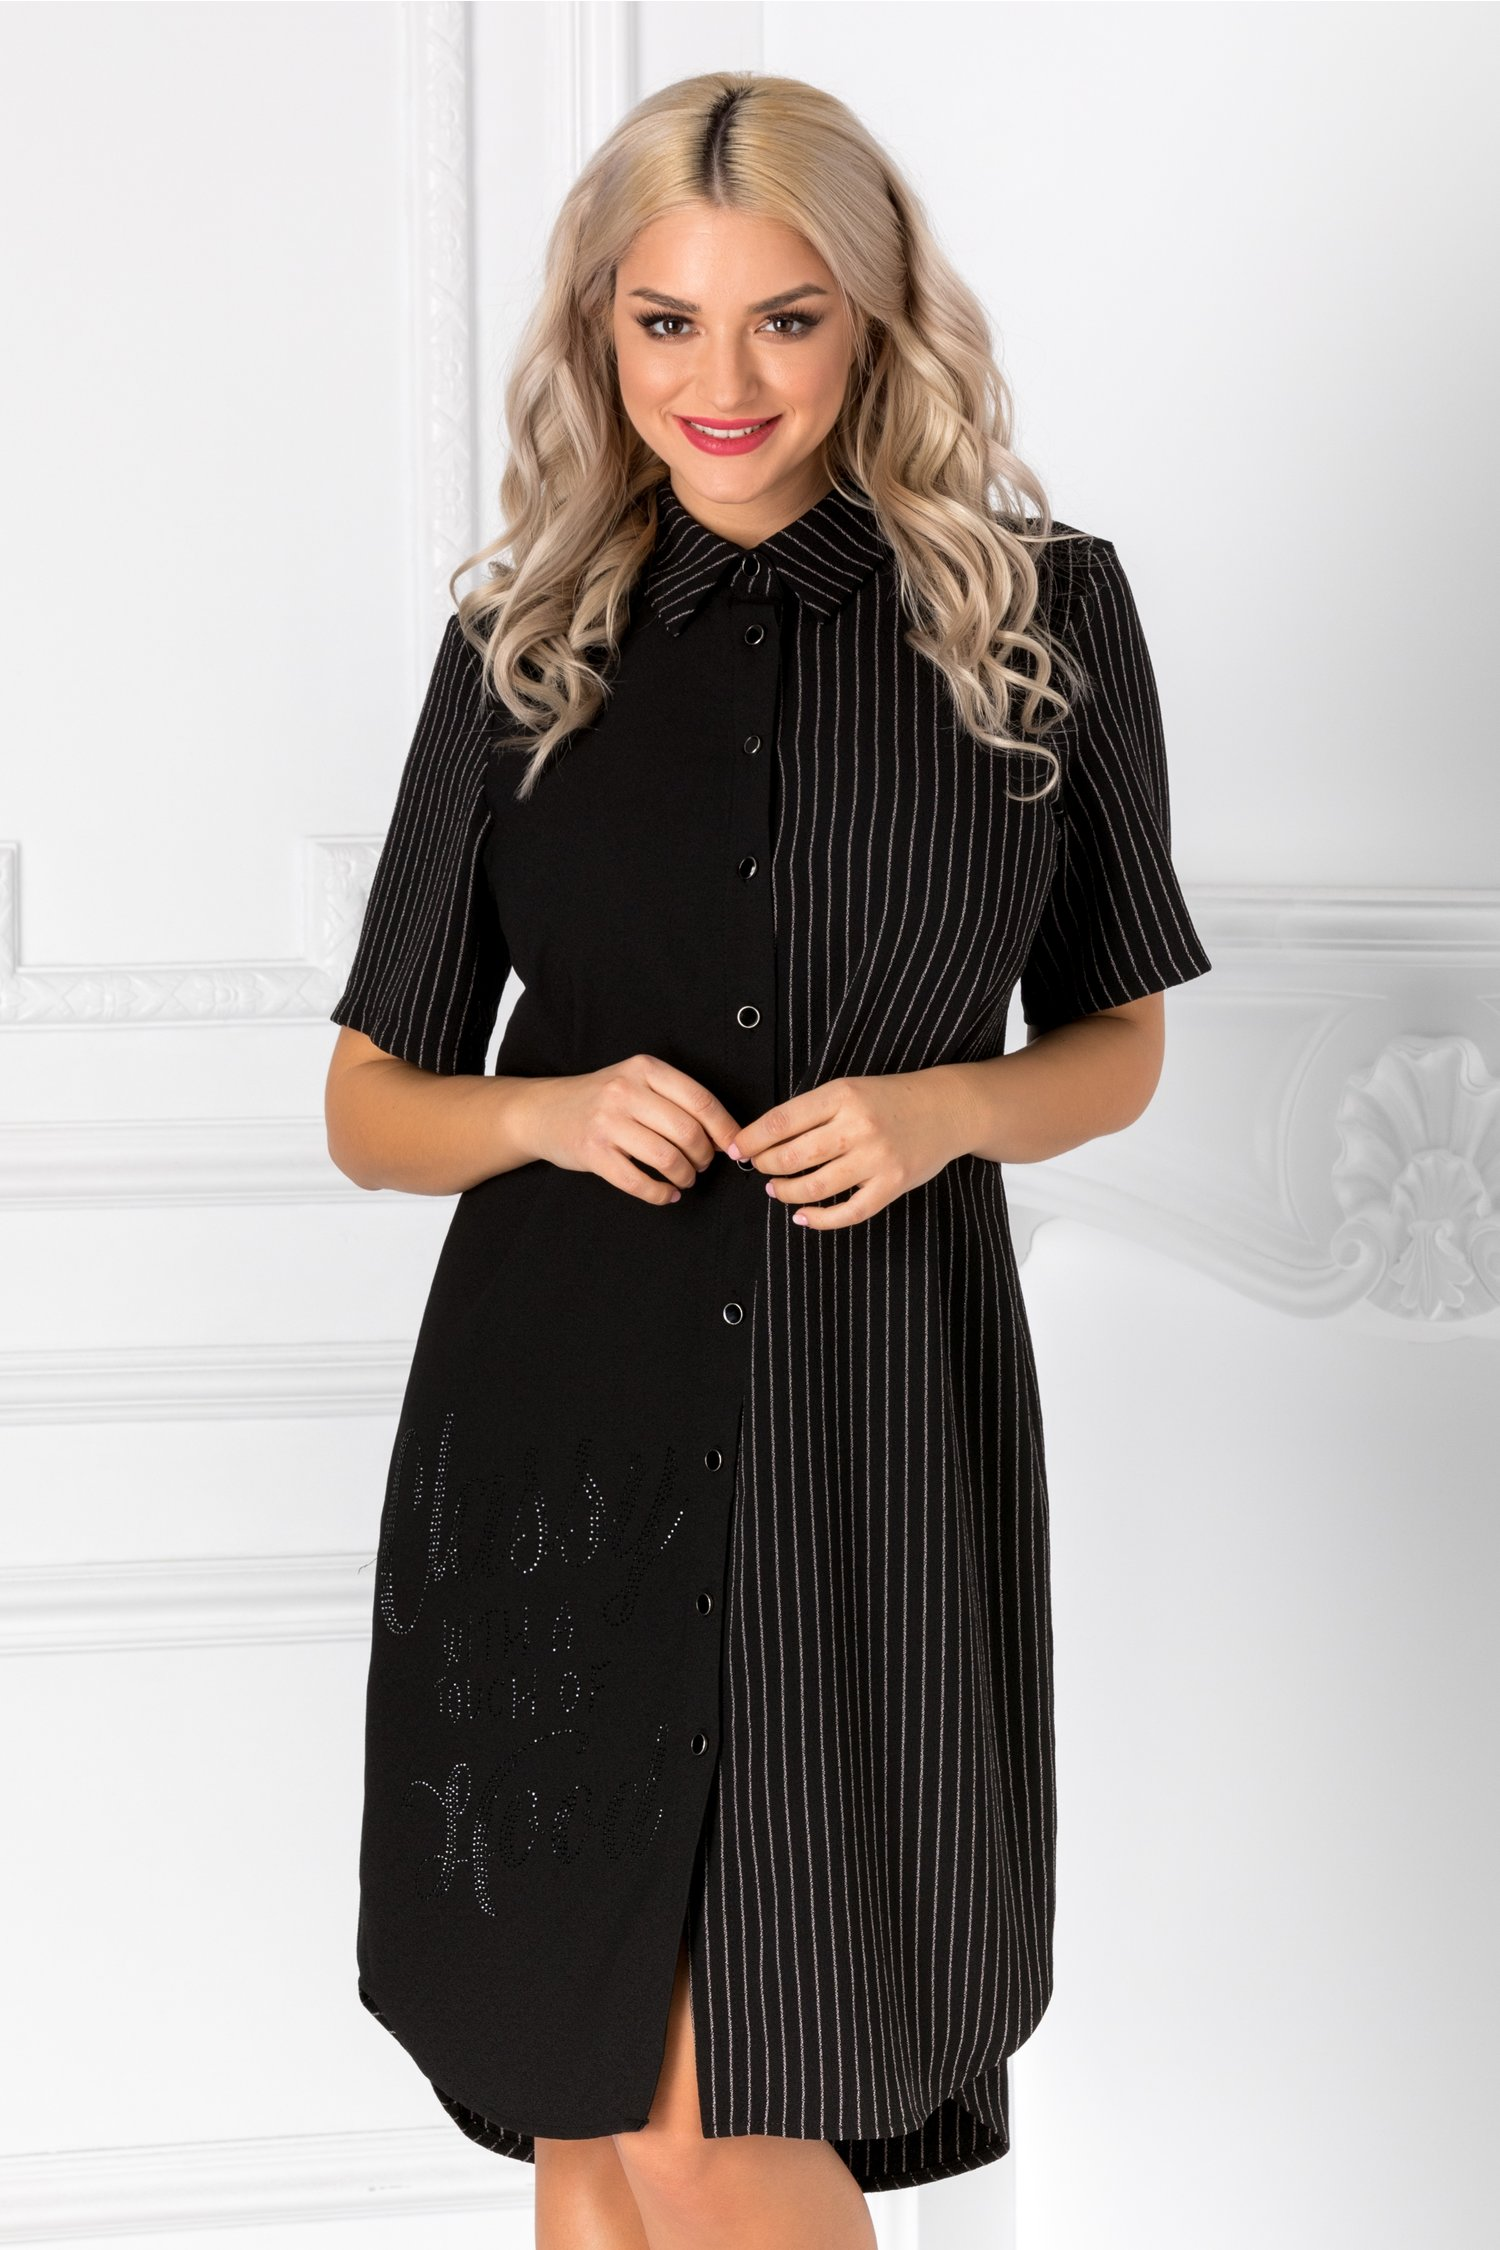 Rochie tip camasa neagra cu dungi albe si strasuri